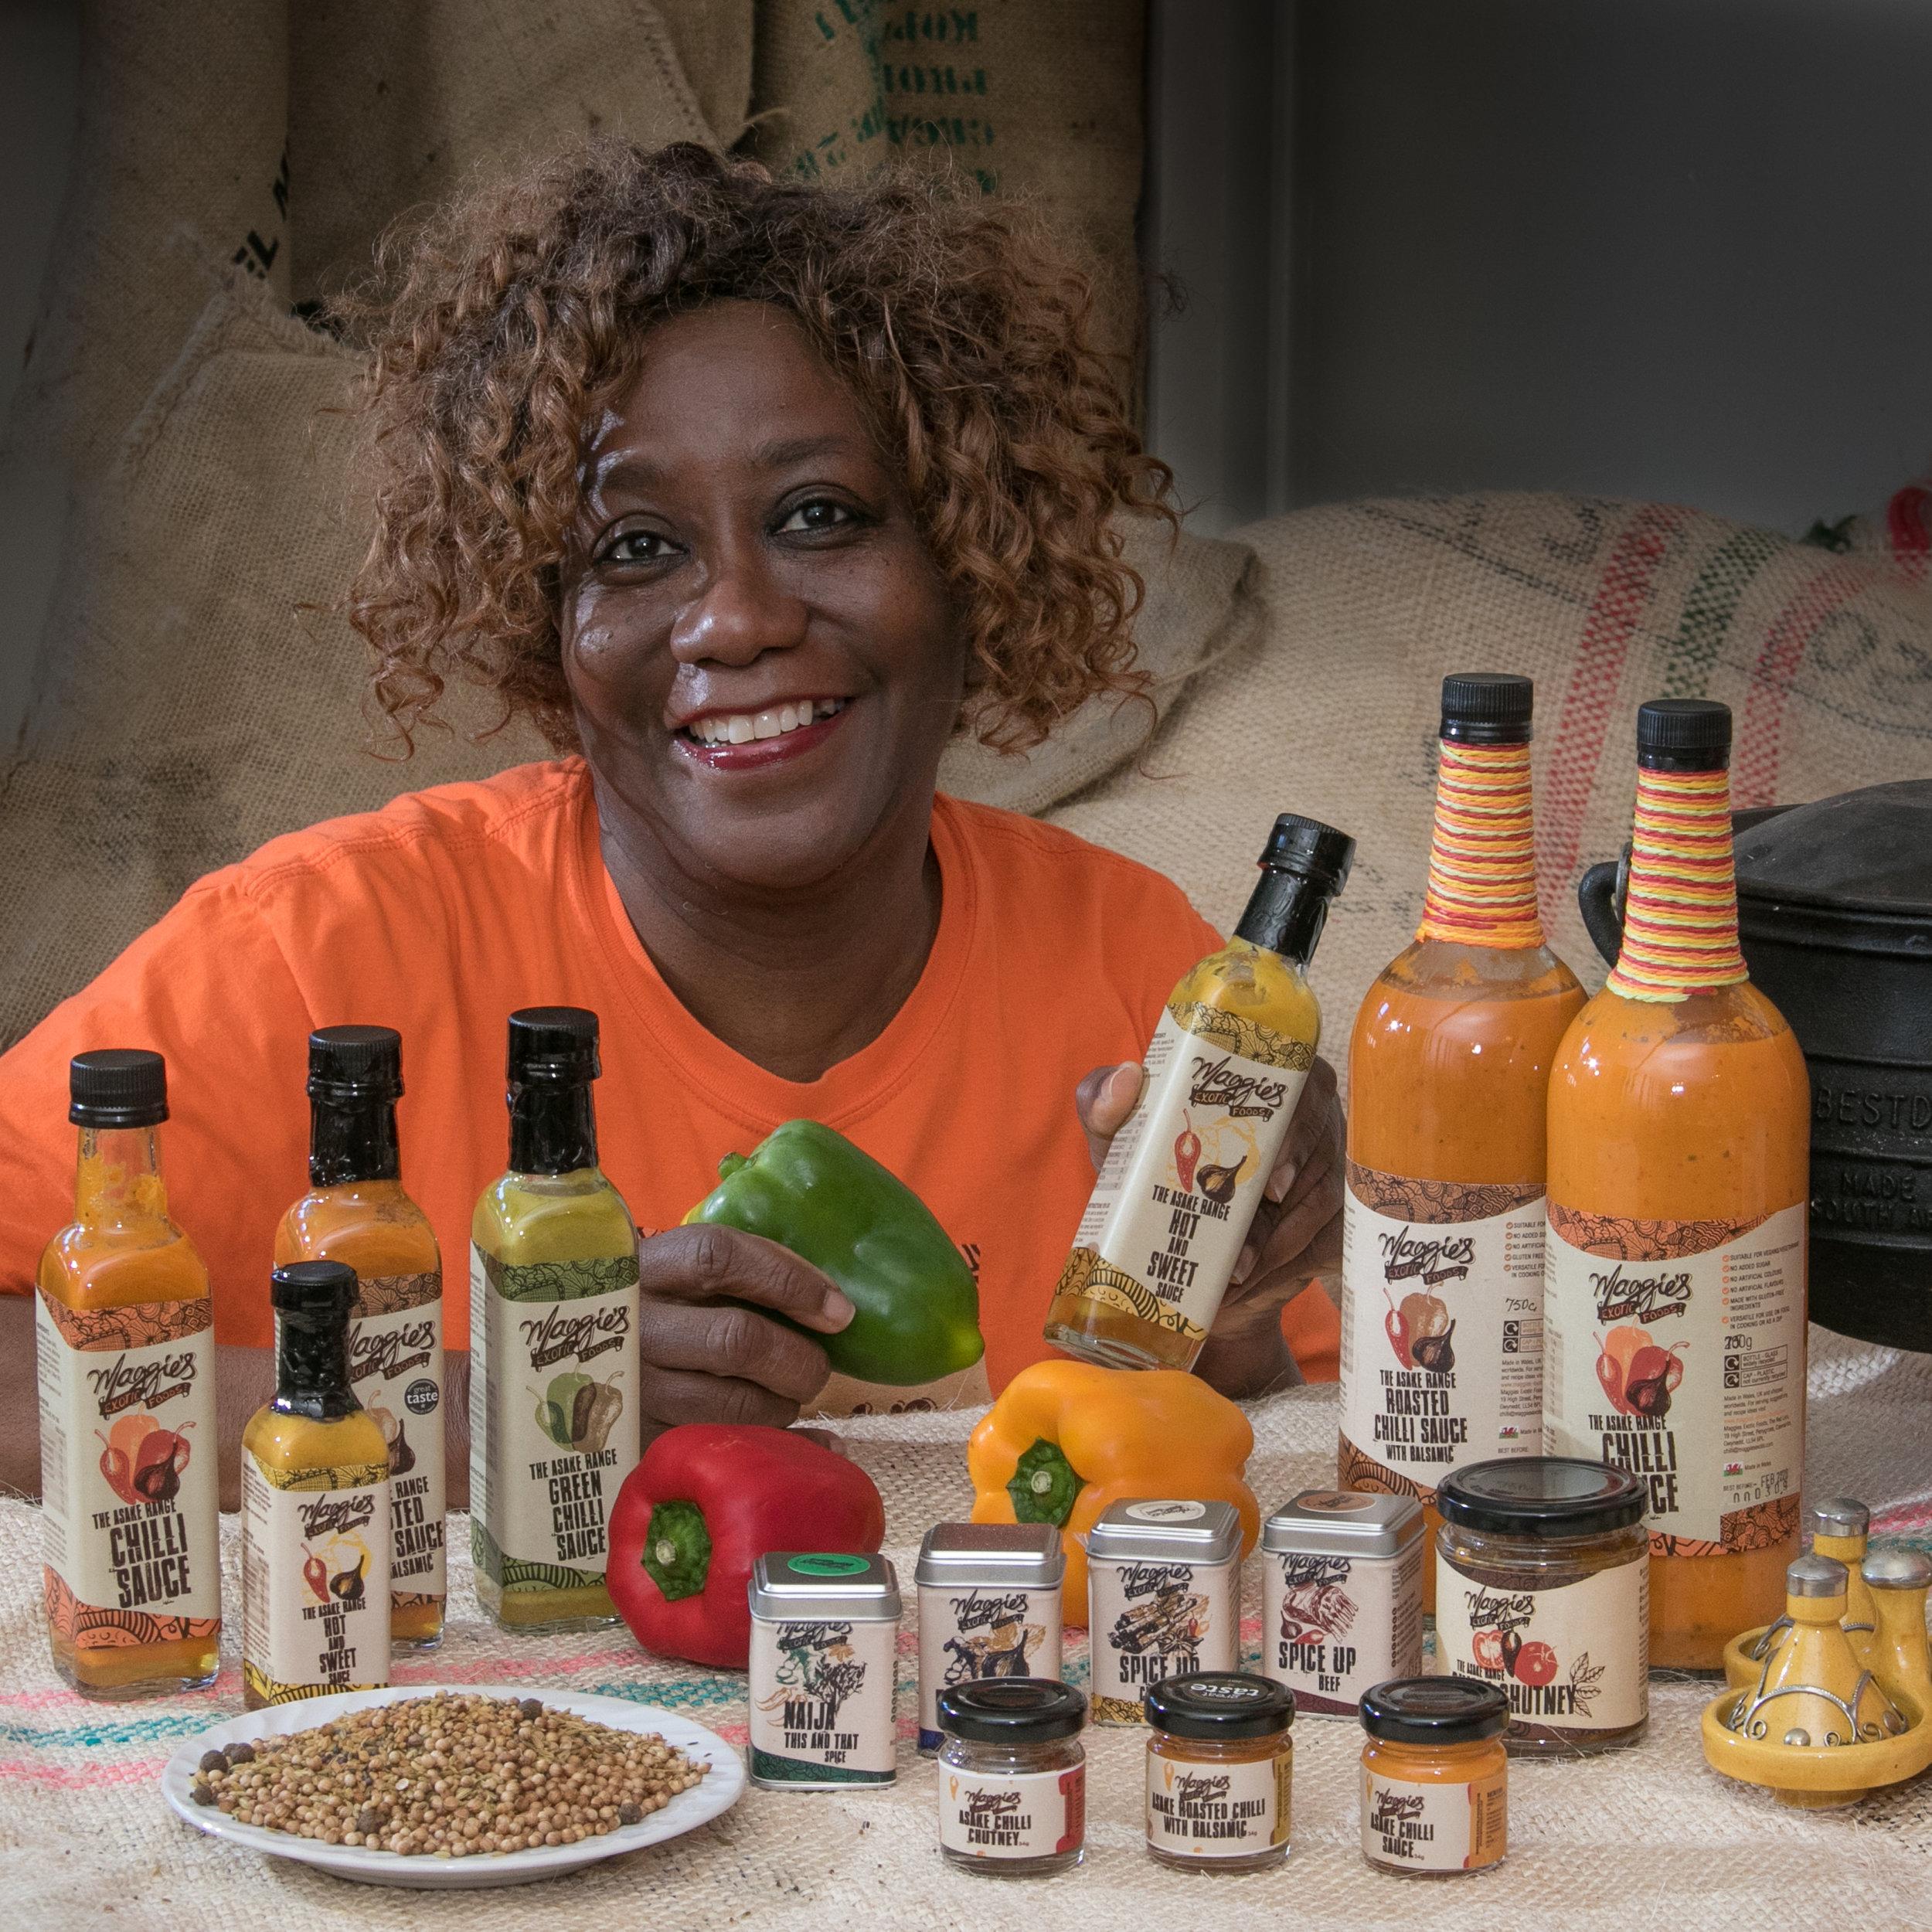 Business-Wales-sauces-case-studies-maggies-exotic-foods.jpg